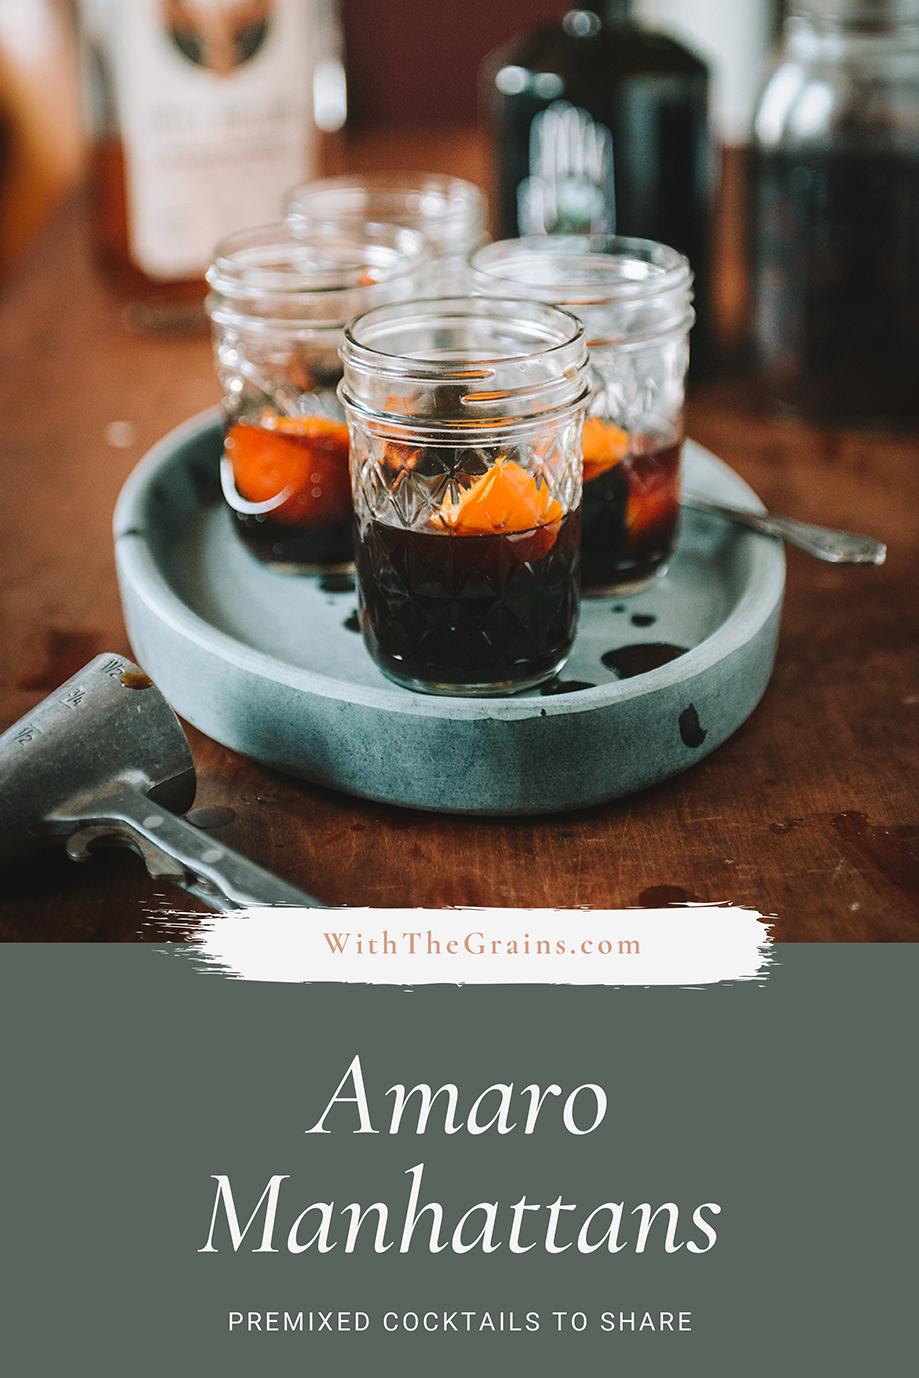 Premixed Amaro Manhattans to Share // www.WithTheGrains.com